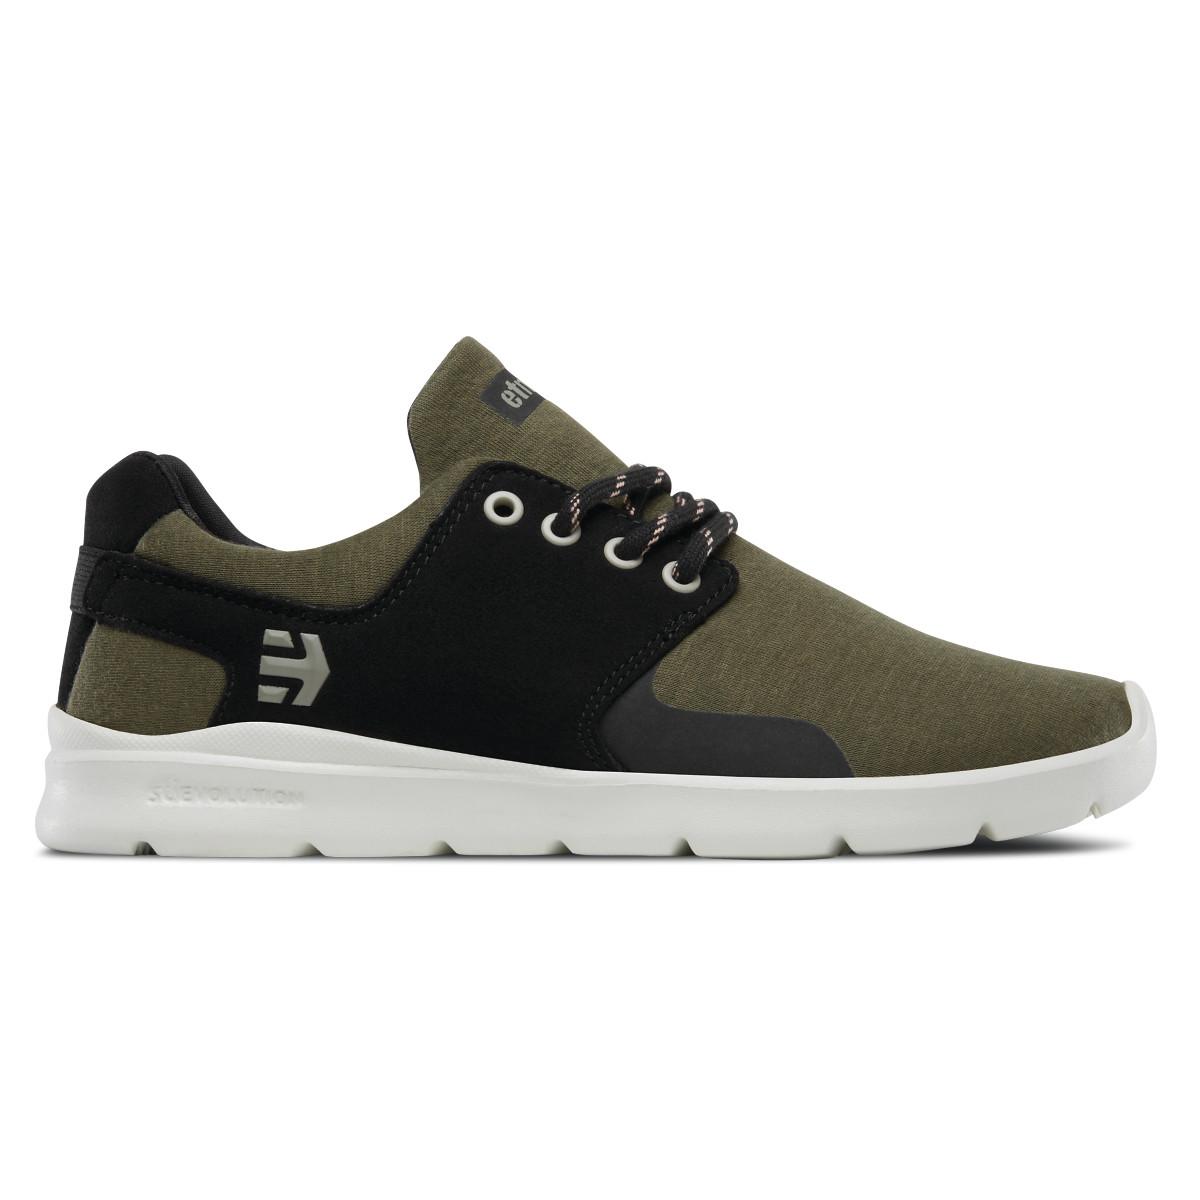 0f2471f9e402 Etnies Shoes Scout XT Womens Green Black